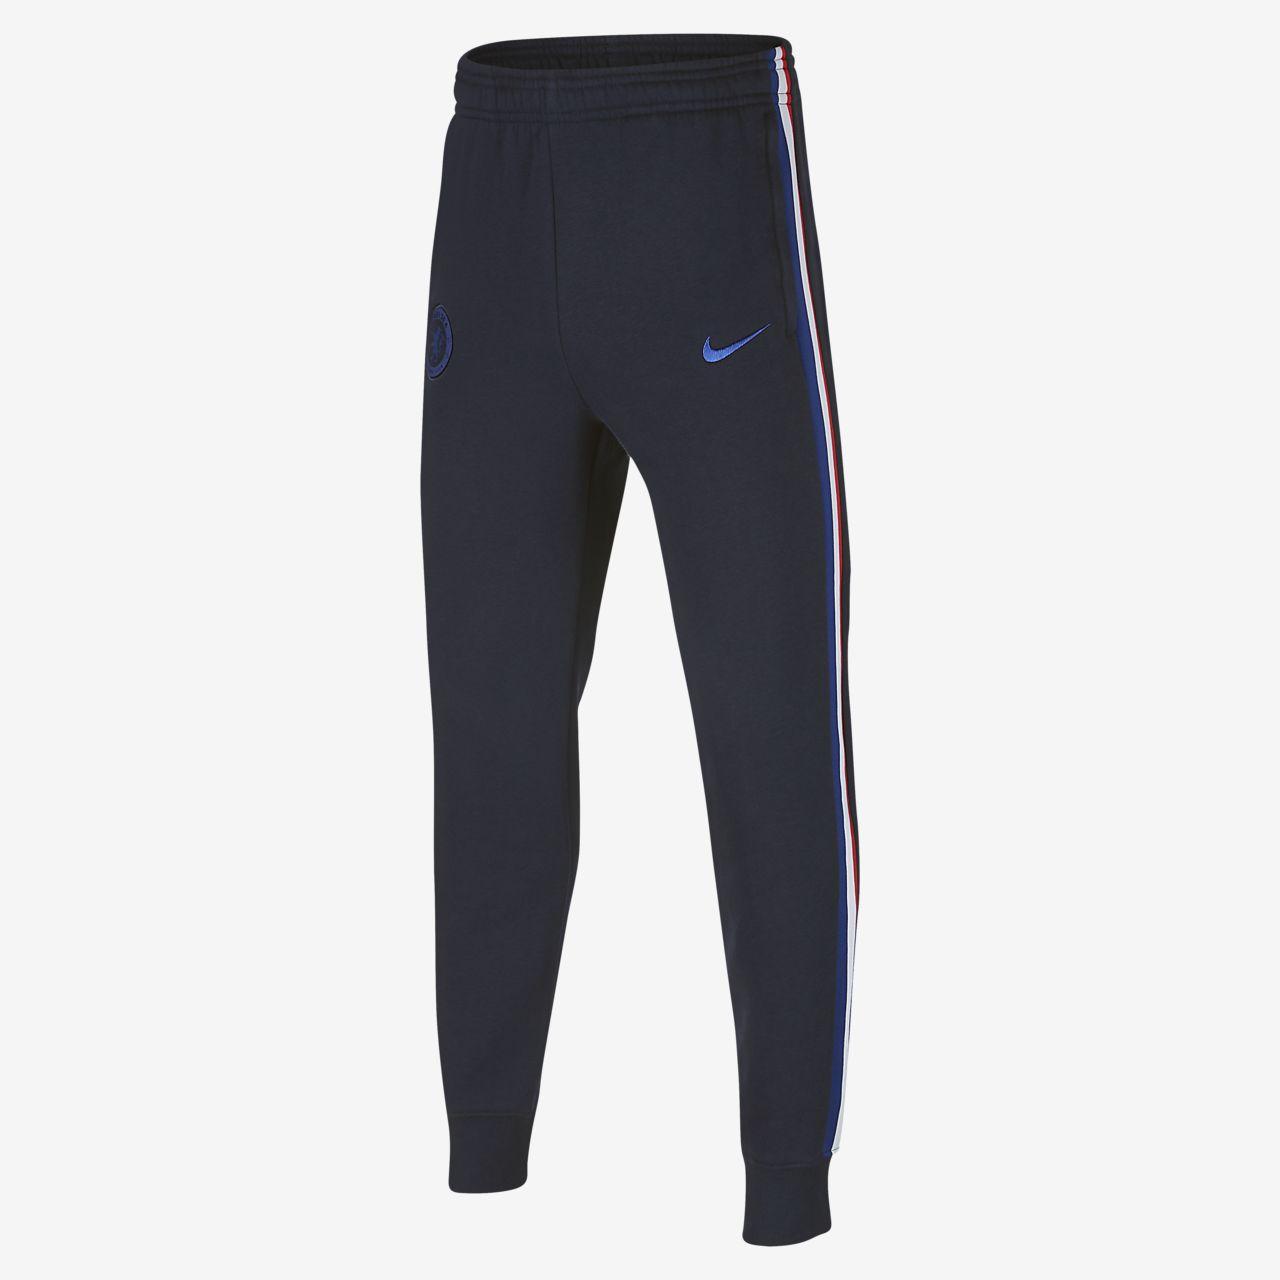 Chelsea FC Older Kids' Fleece Pants